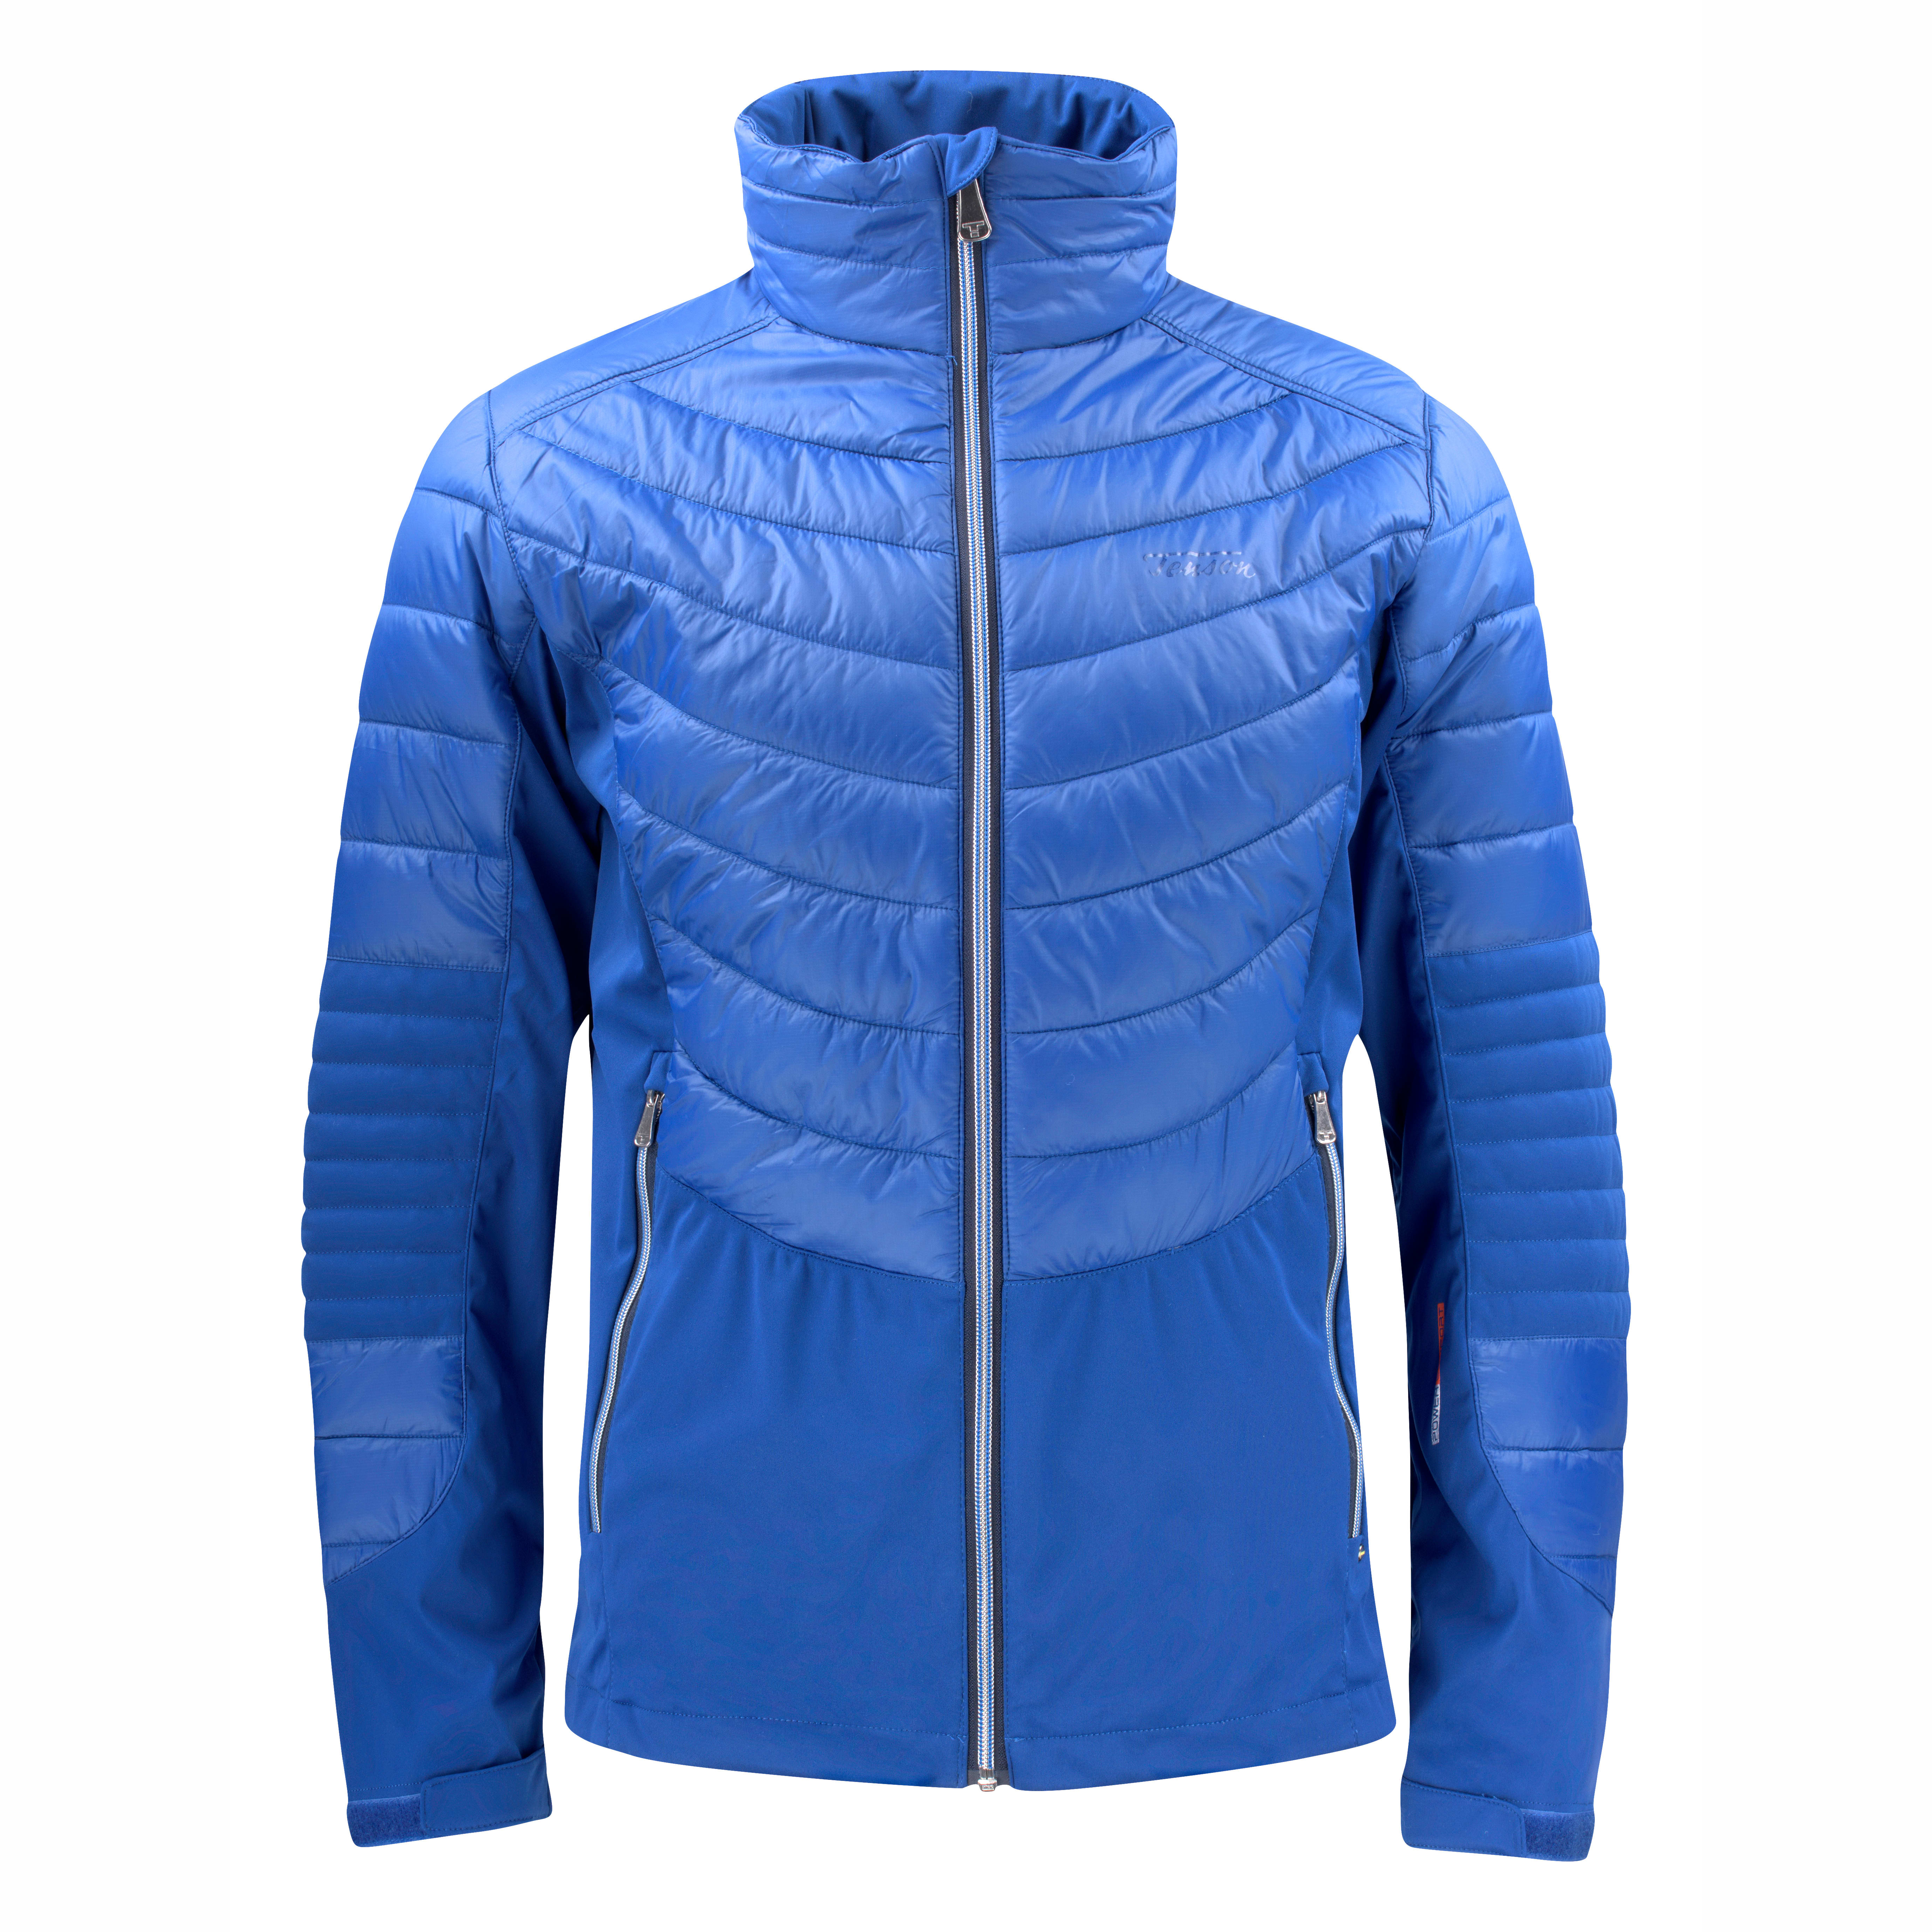 Nexus Men's Softshell Jacket